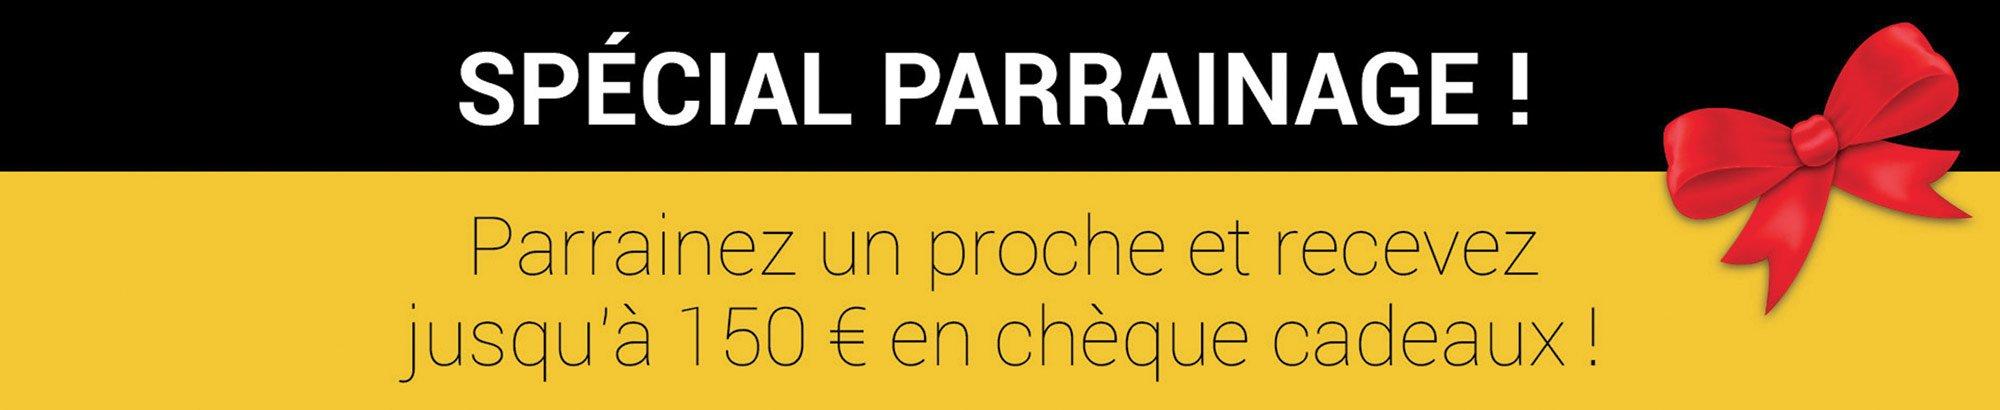 parrainage small - Accueil